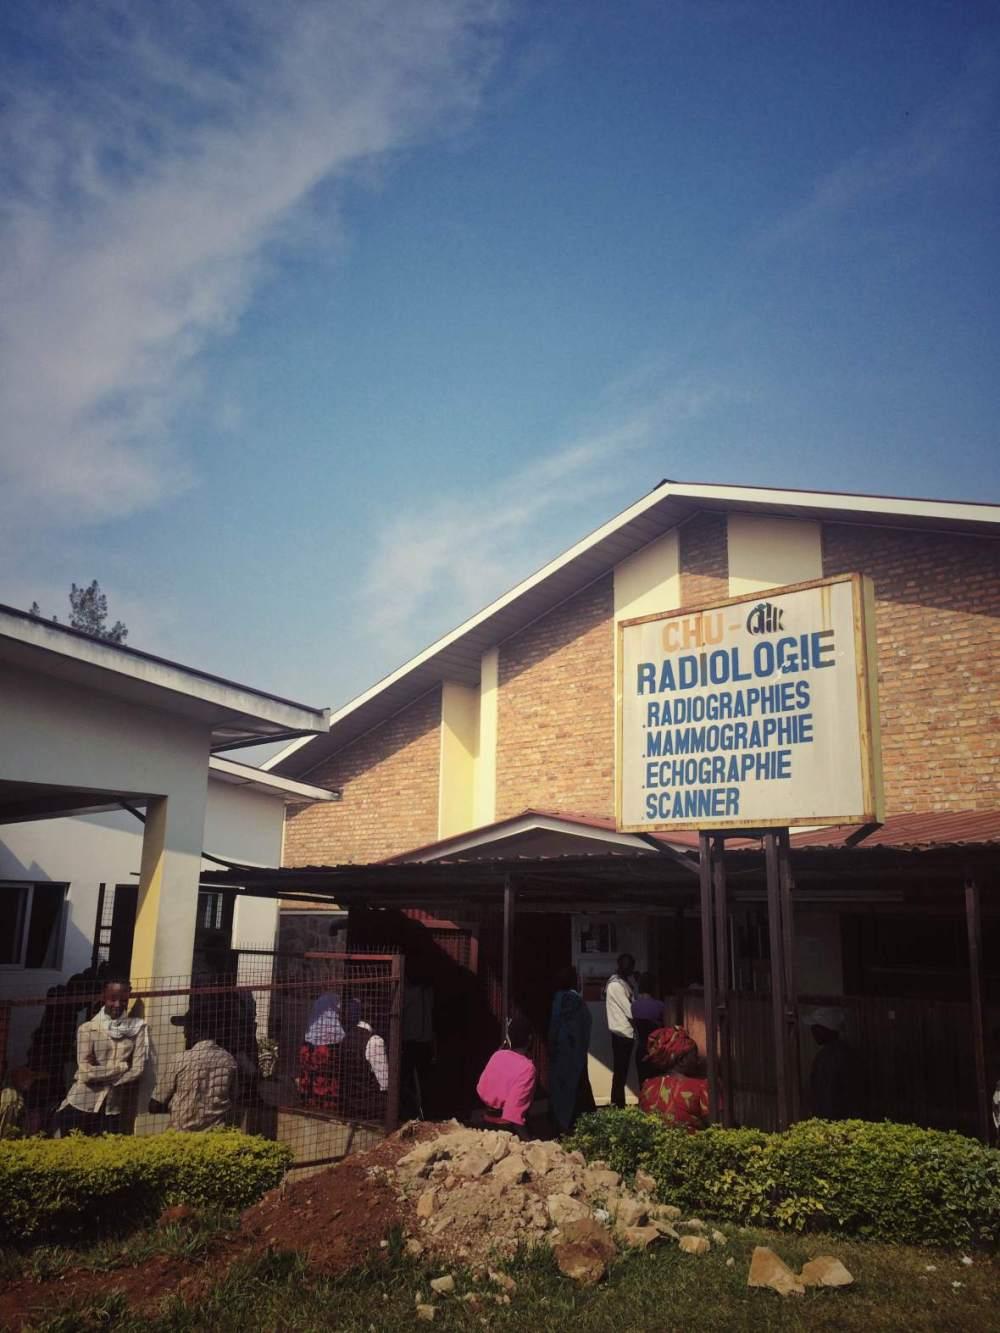 Burgess Romano_Rwanda - radiologyCHUK